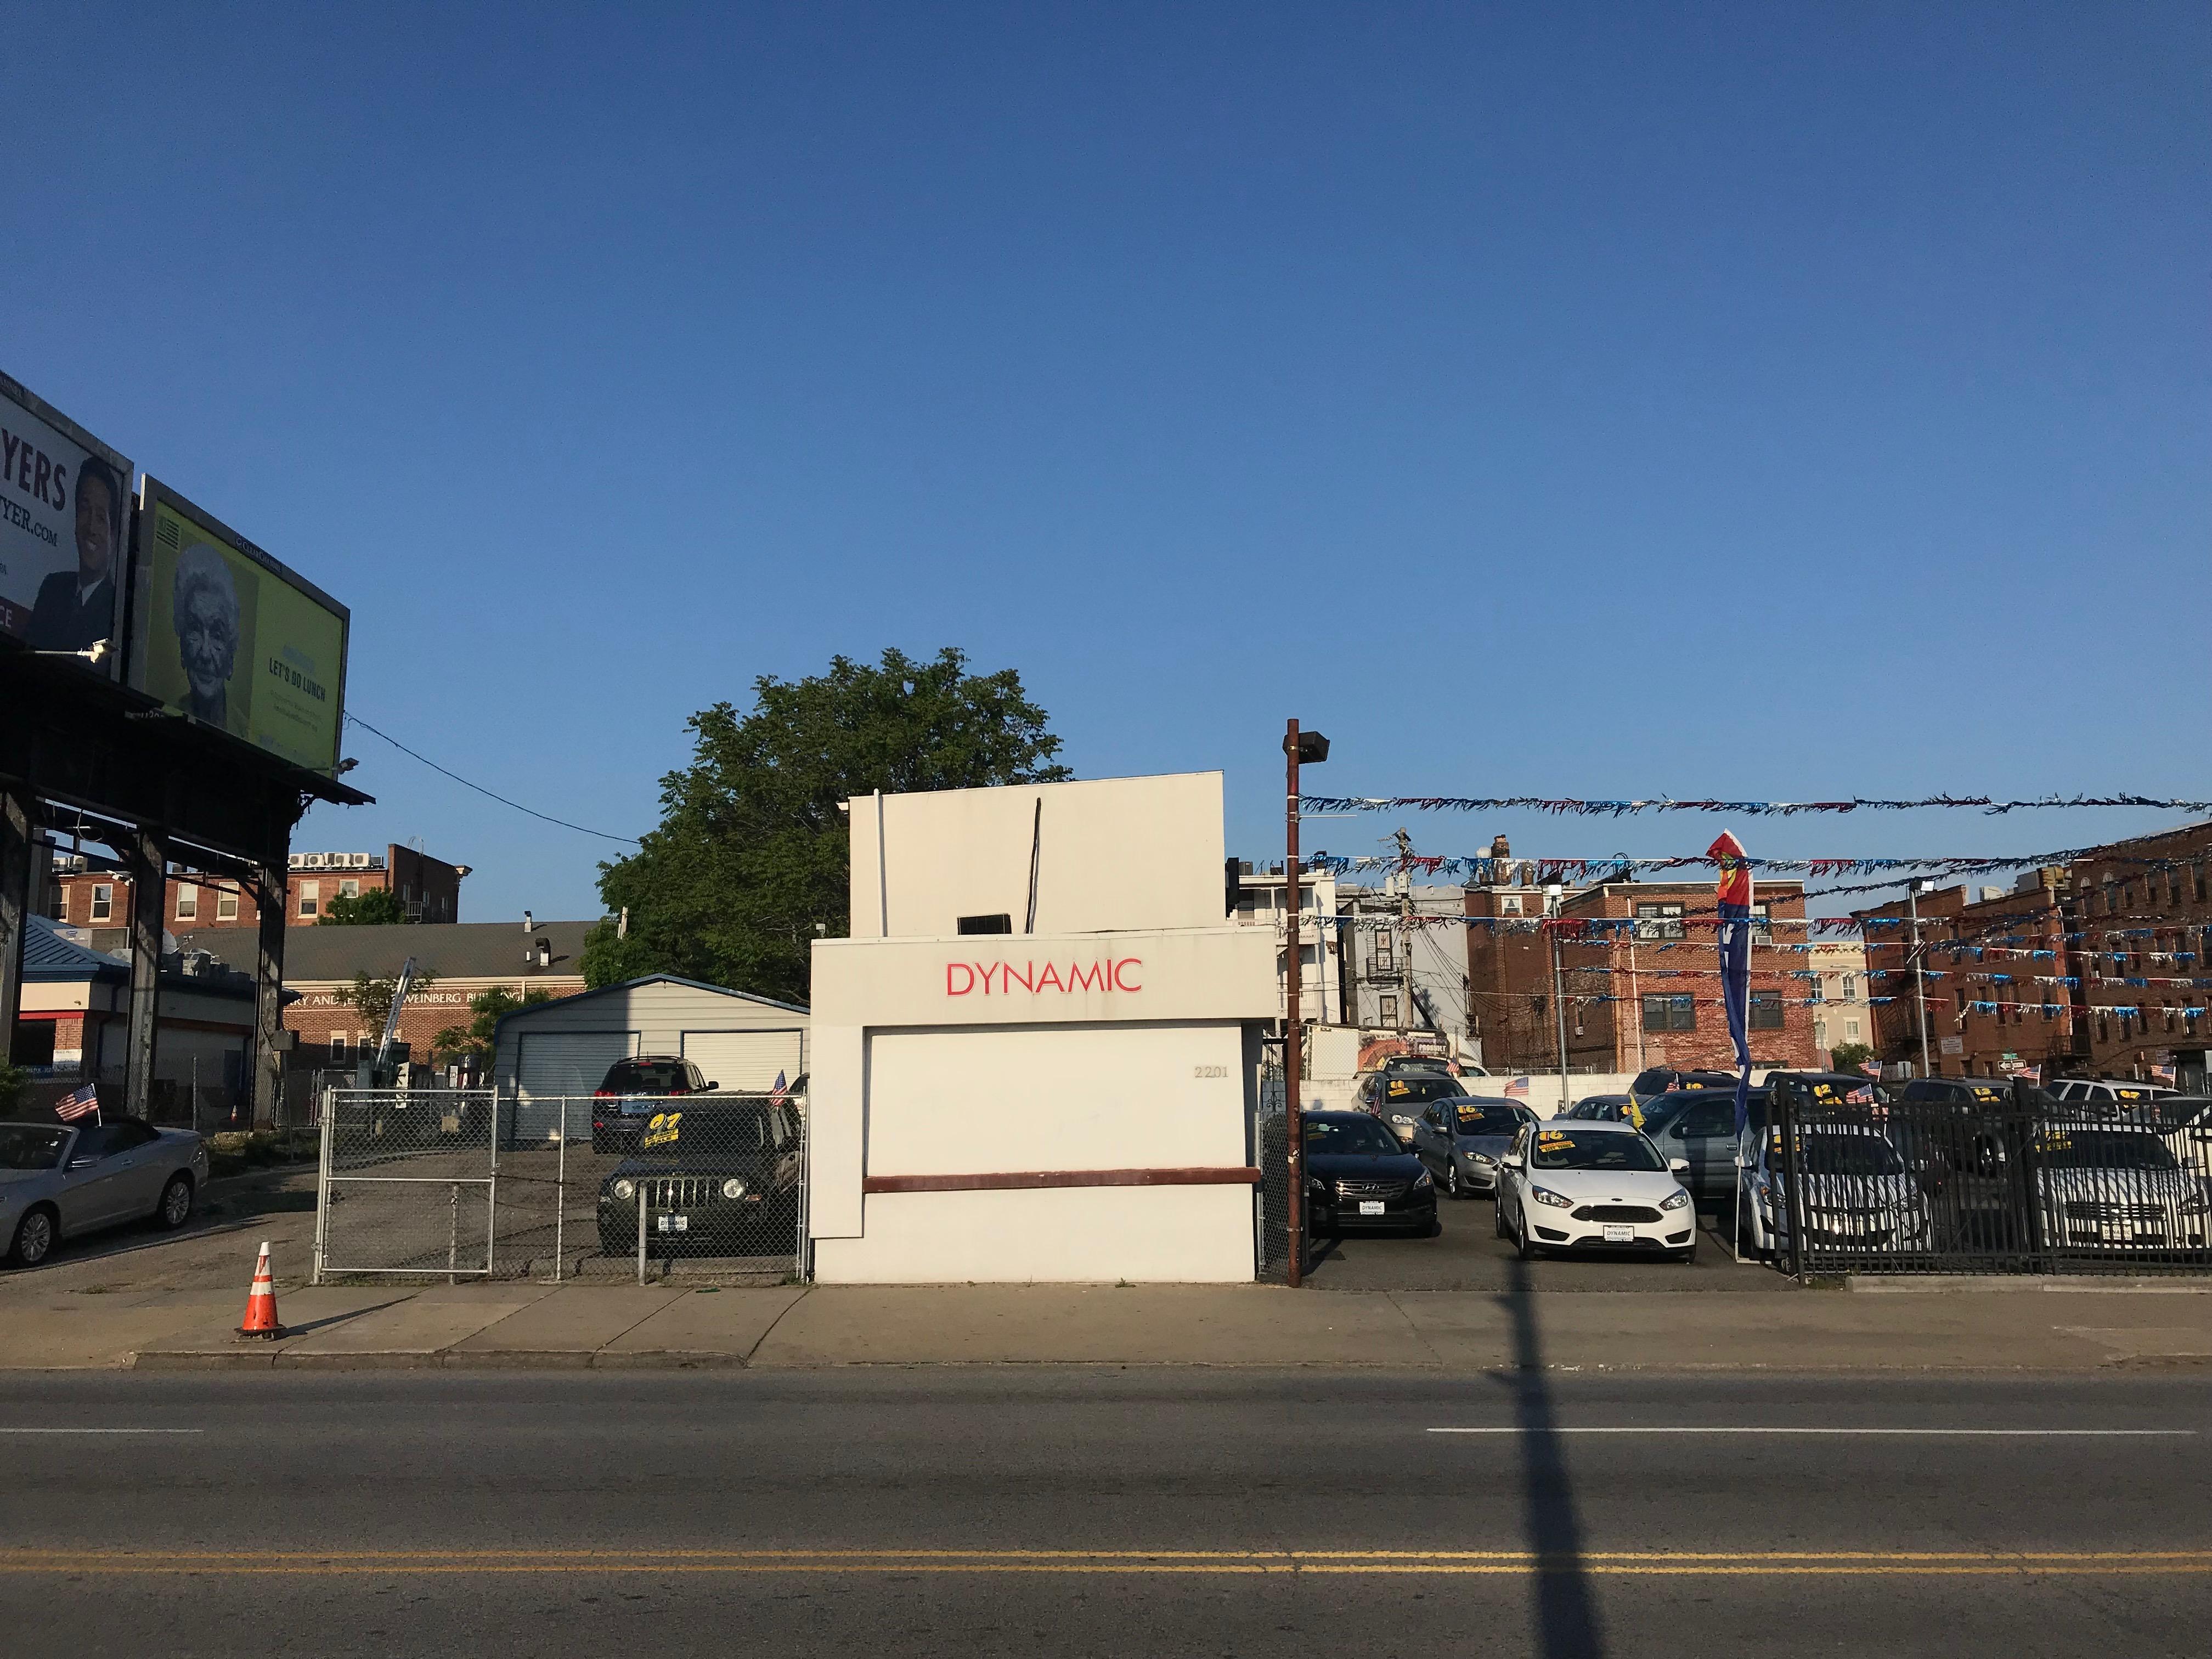 Dynamic Cars, 2201 N. Howard Street, Baltimore, MD 21218, 22nd Street, Automobile dealership, Baltimore, Baltimore City, HQ Photo